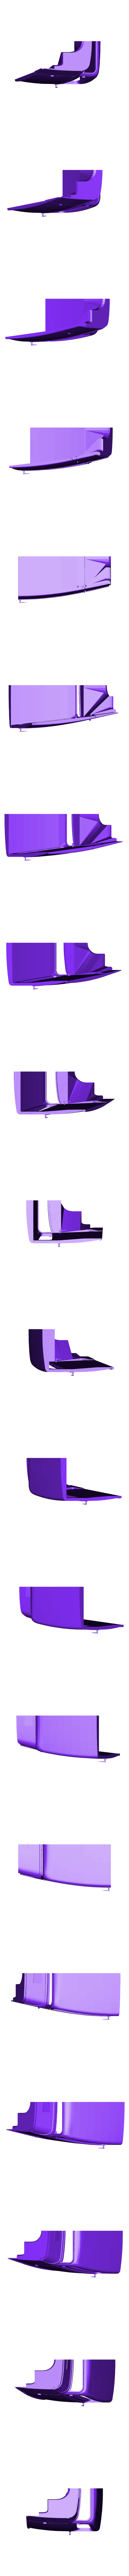 hotrod flanc 1.stl Download STL file Fury road hotrod bodyshell 1/10 • 3D printing design, RCGANG93